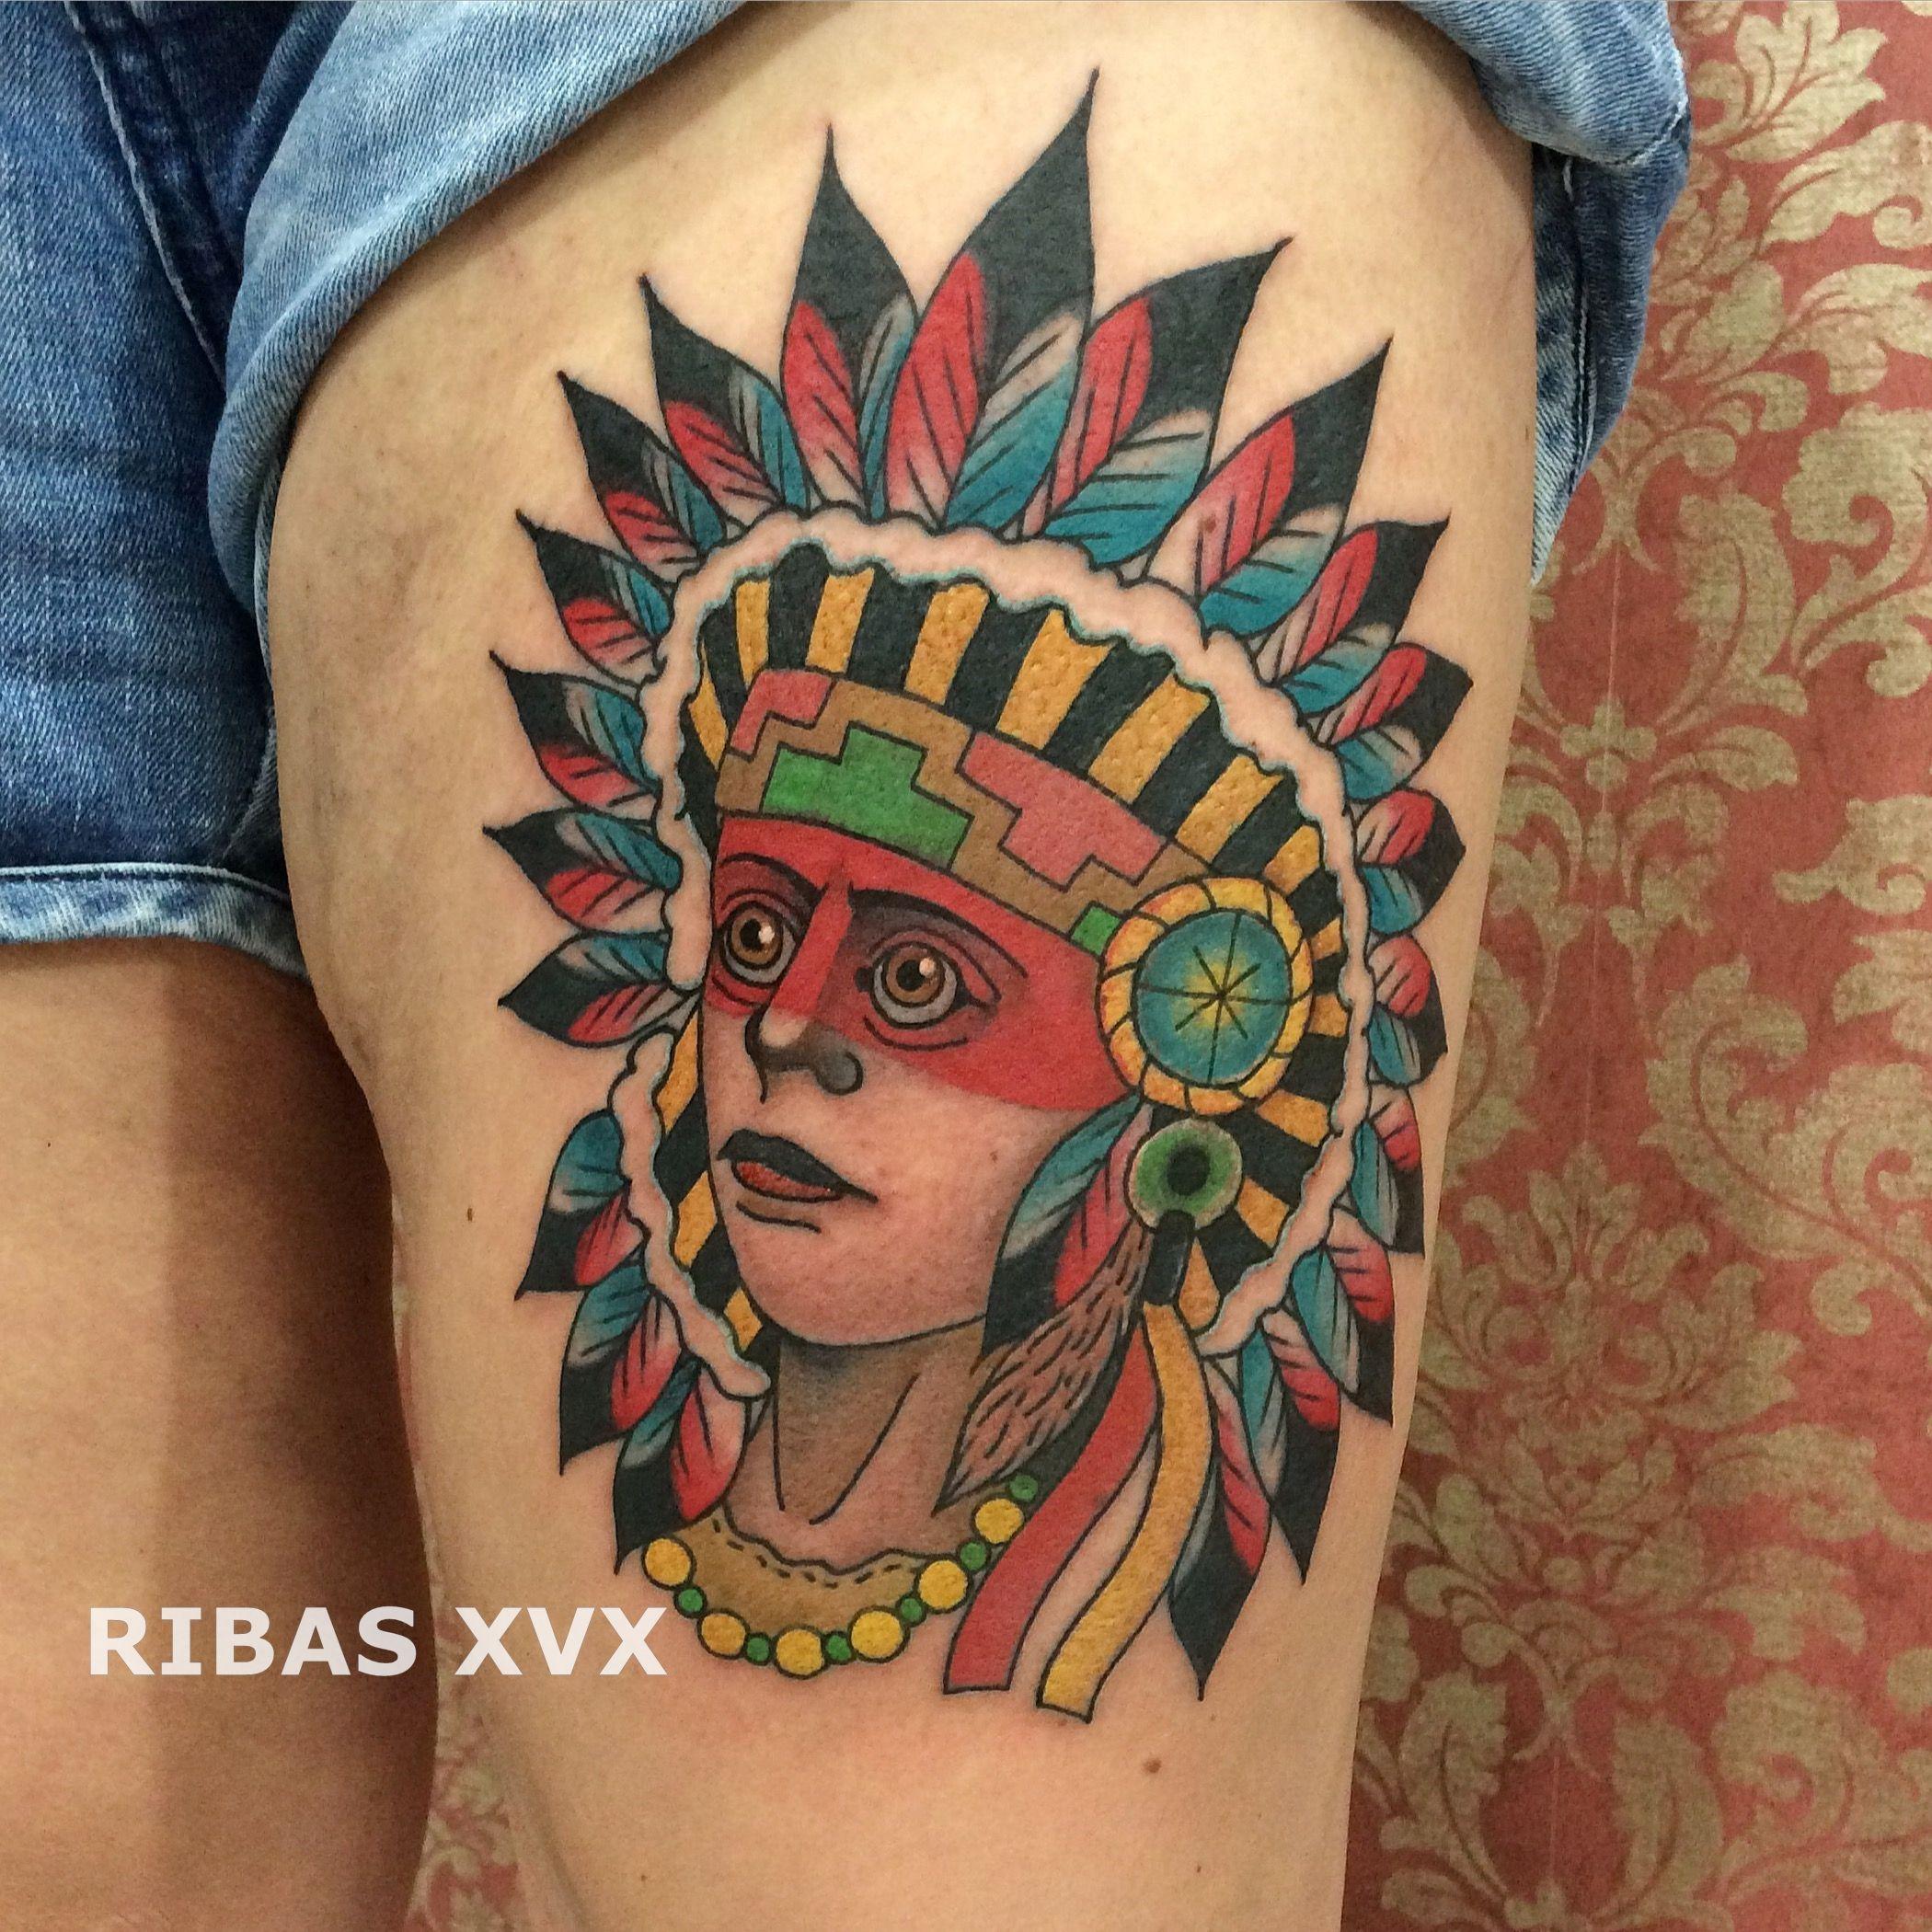 tatuagem indígena native american traditional tattoo ribas xvx